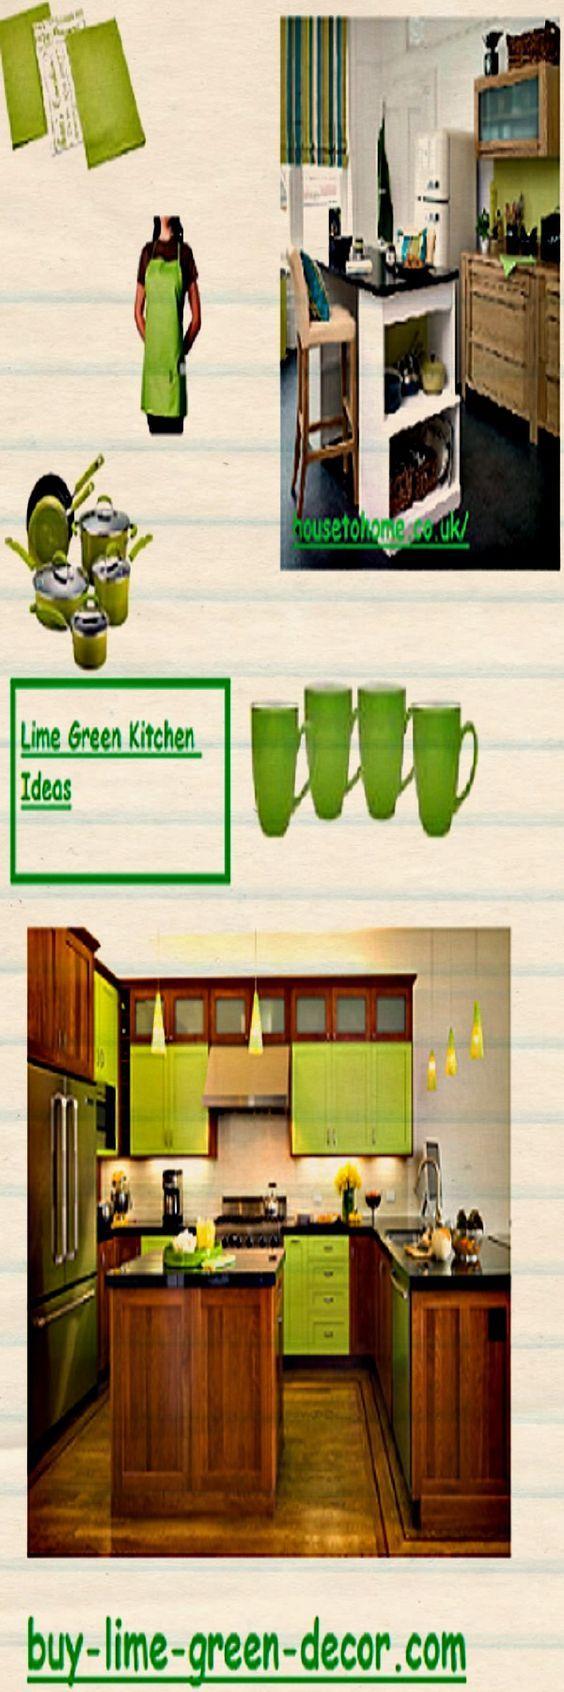 Best 25+ Lime green kitchen ideas on Pinterest | Green bath ...